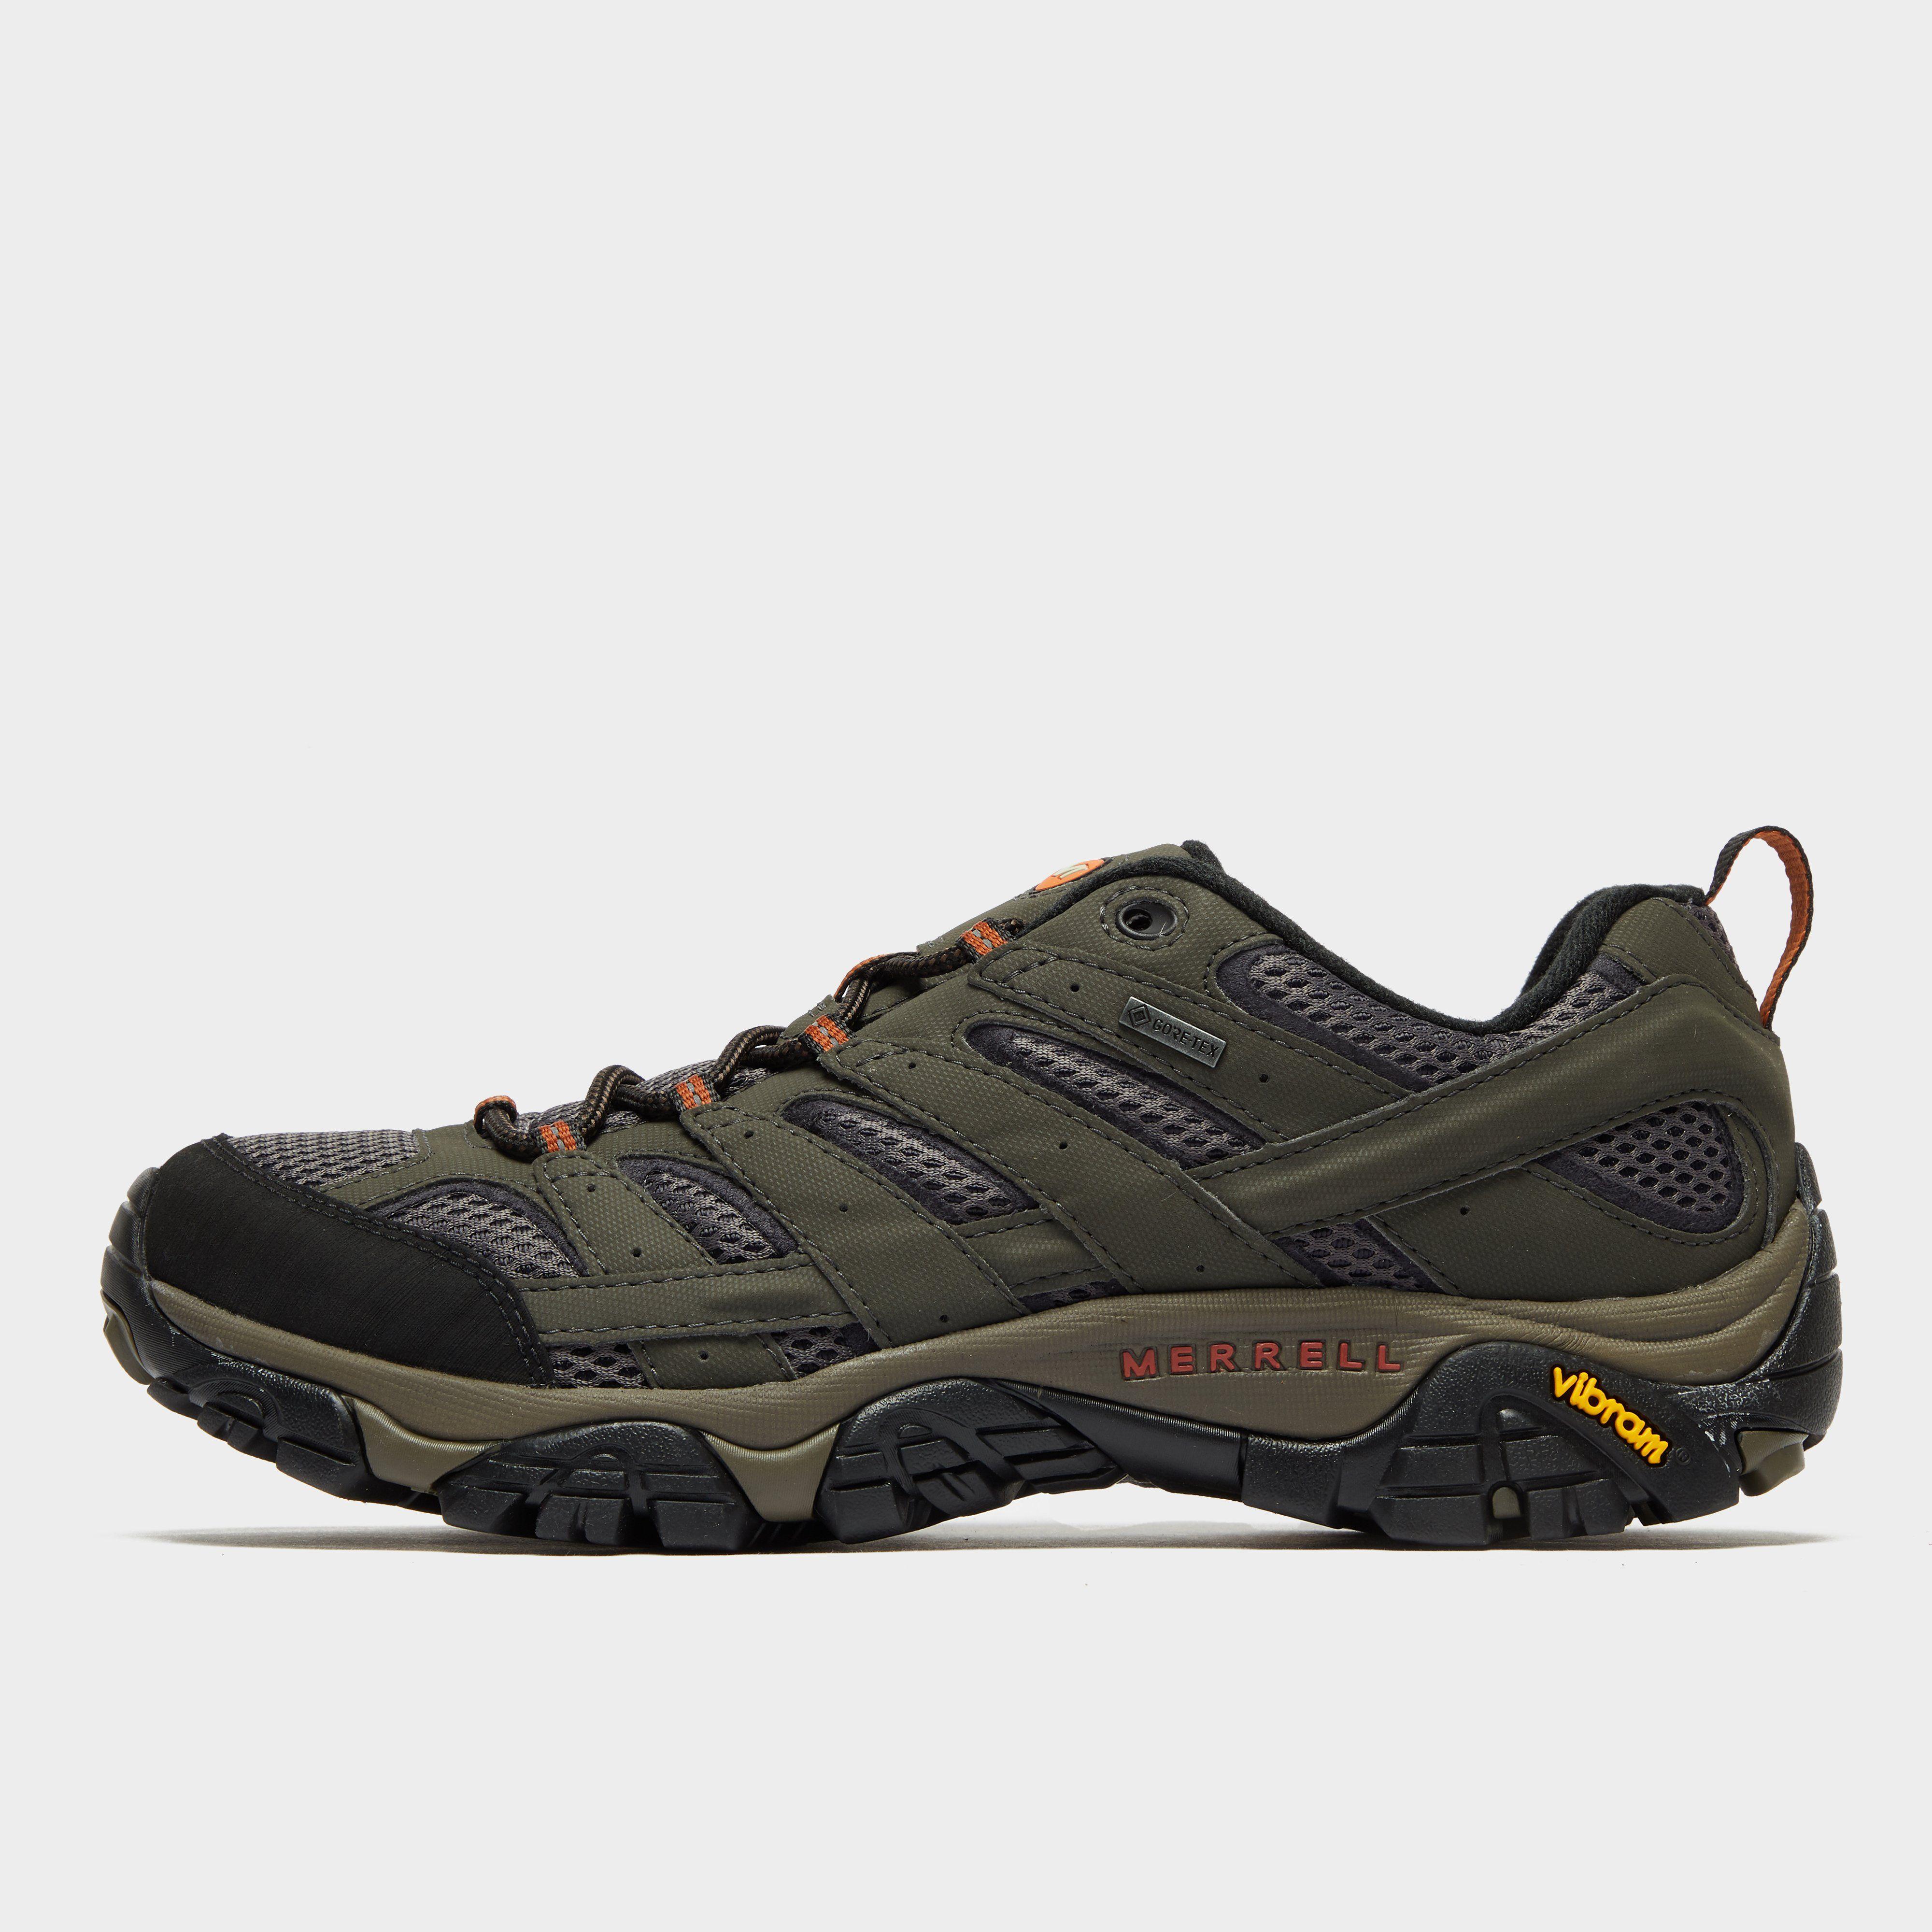 MERRELL Men's Moab 2 Gore-Tex® Hiking Shoes